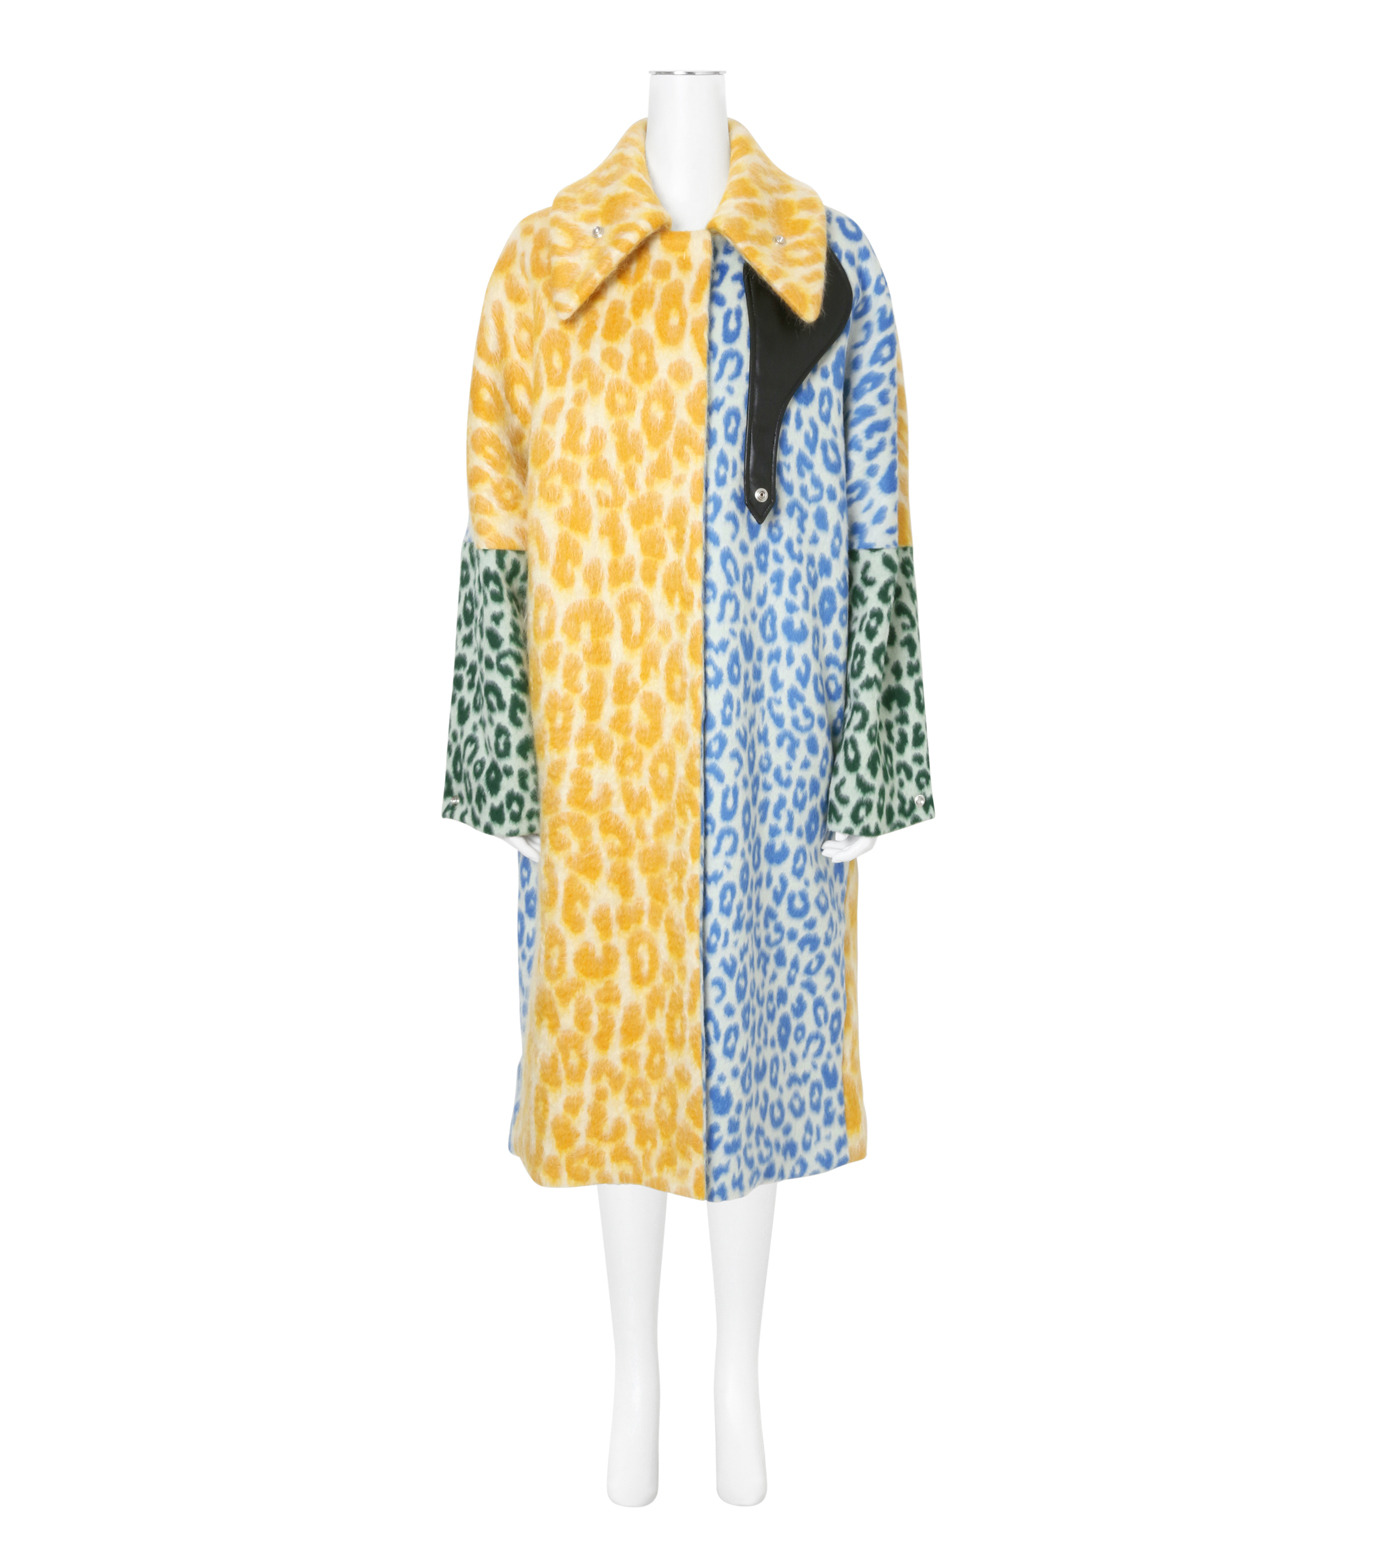 ACNE STUDIOS(アクネ ストゥディオズ)のLeopard Multicolor Coat-MULTI COLOUR(コート/coat)-12Z164-9 拡大詳細画像1